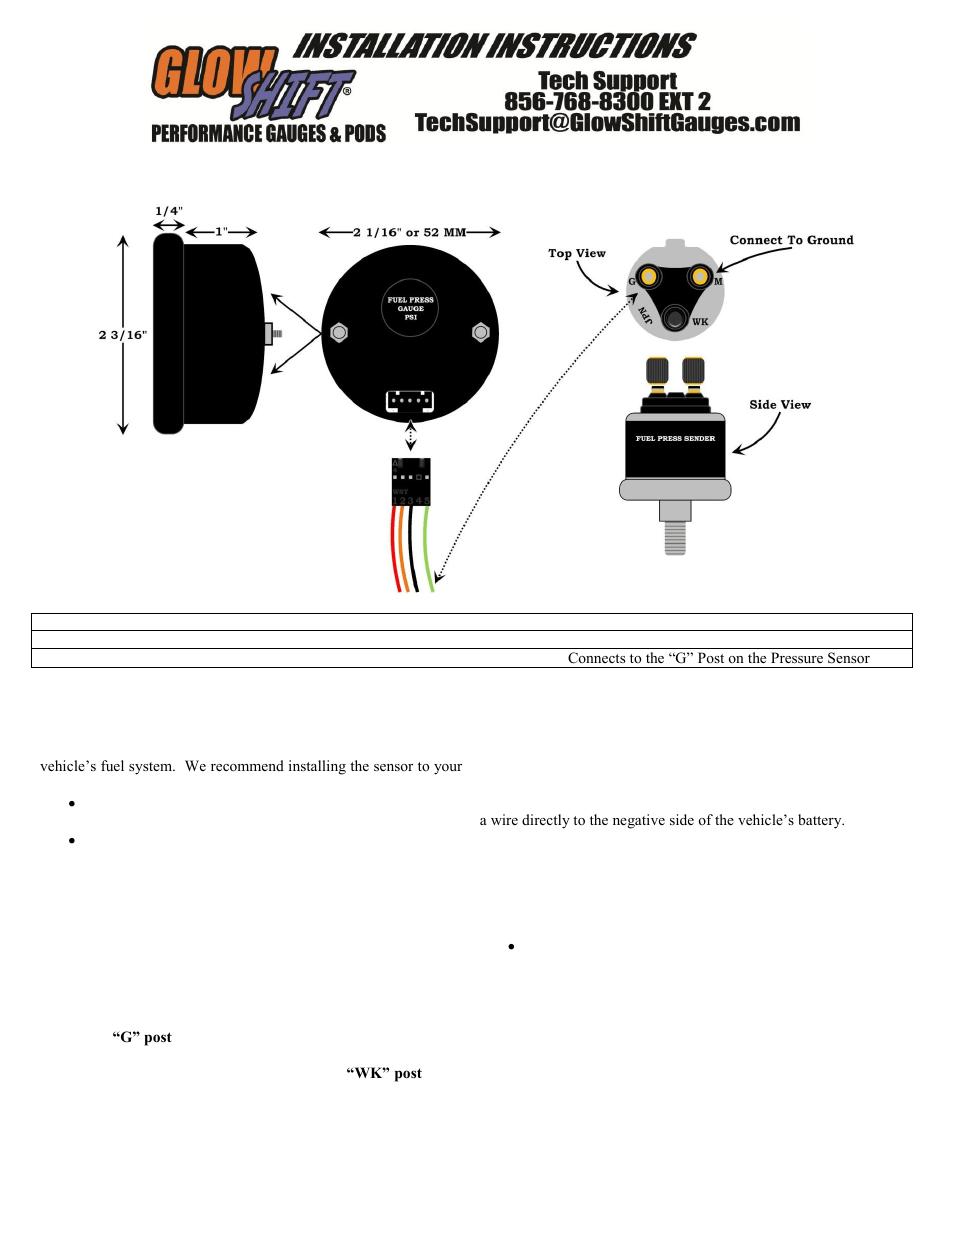 glowshift digital series fuel pressure gauge page1?resize\\\=665%2C861 glow shift boost gauge wiring diagram glow shift oil pressure  at readyjetset.co